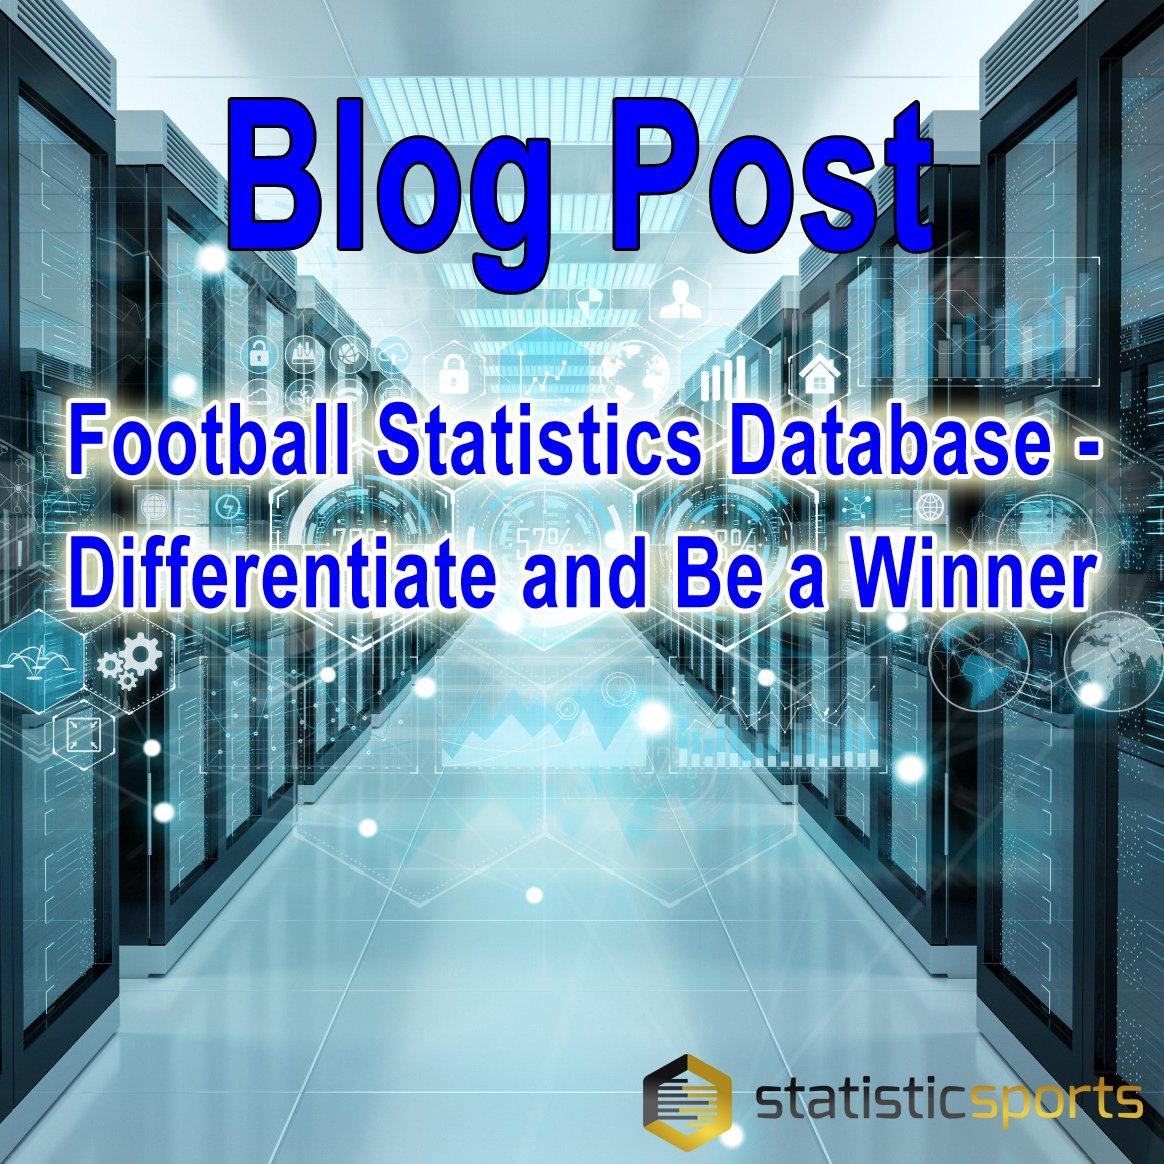 statisticsports hashtag on Twitter